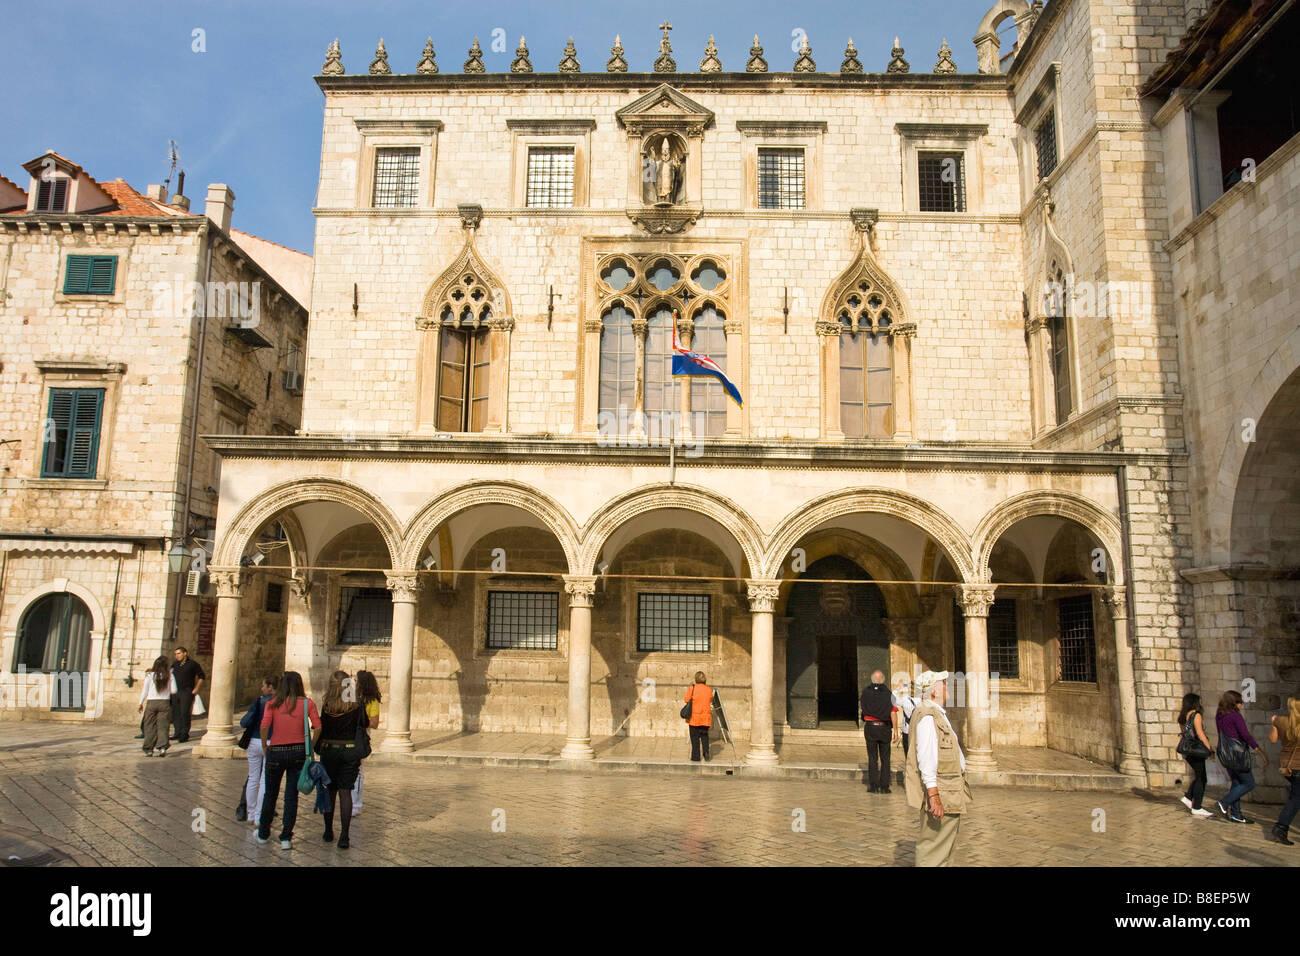 Sponza Palace exterior Dubrovnik Dalmatia Croatia Europe - Stock Image